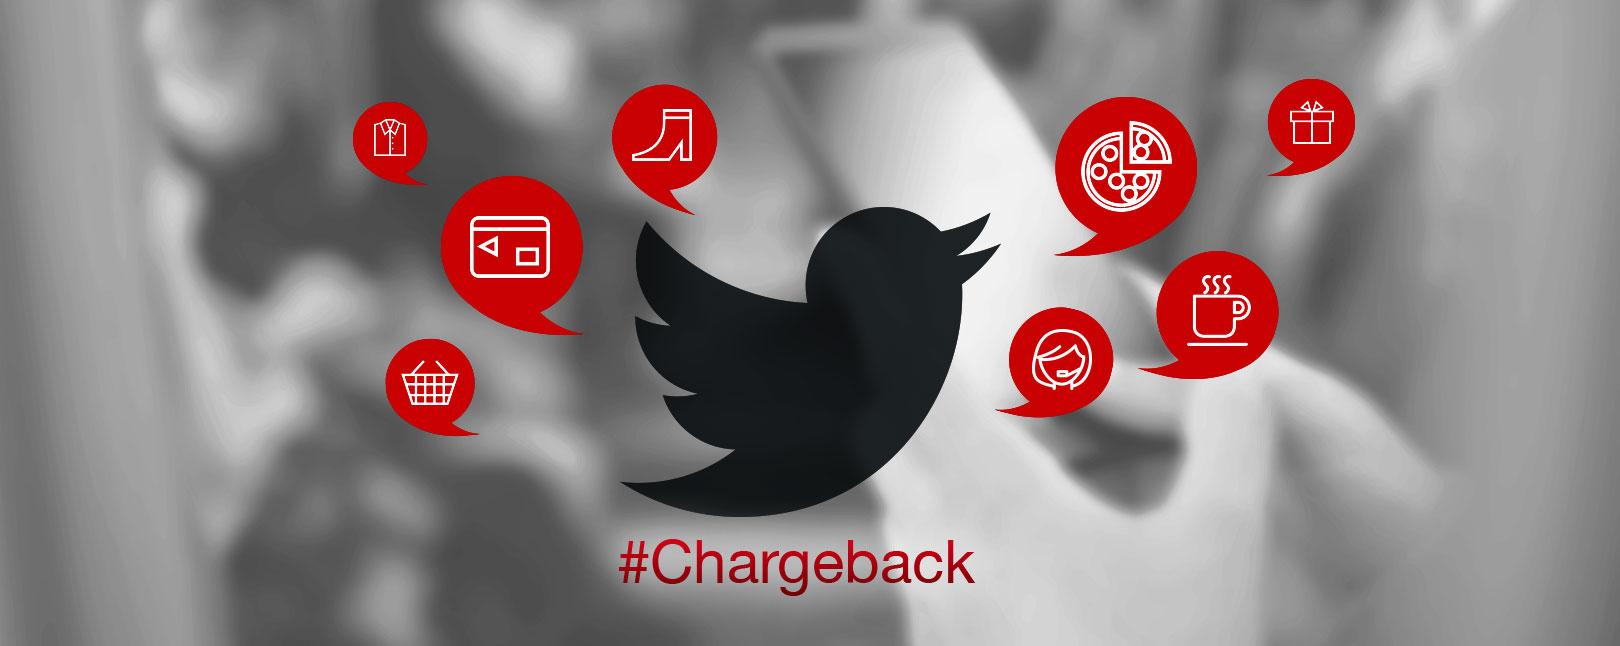 twitter chargebacks